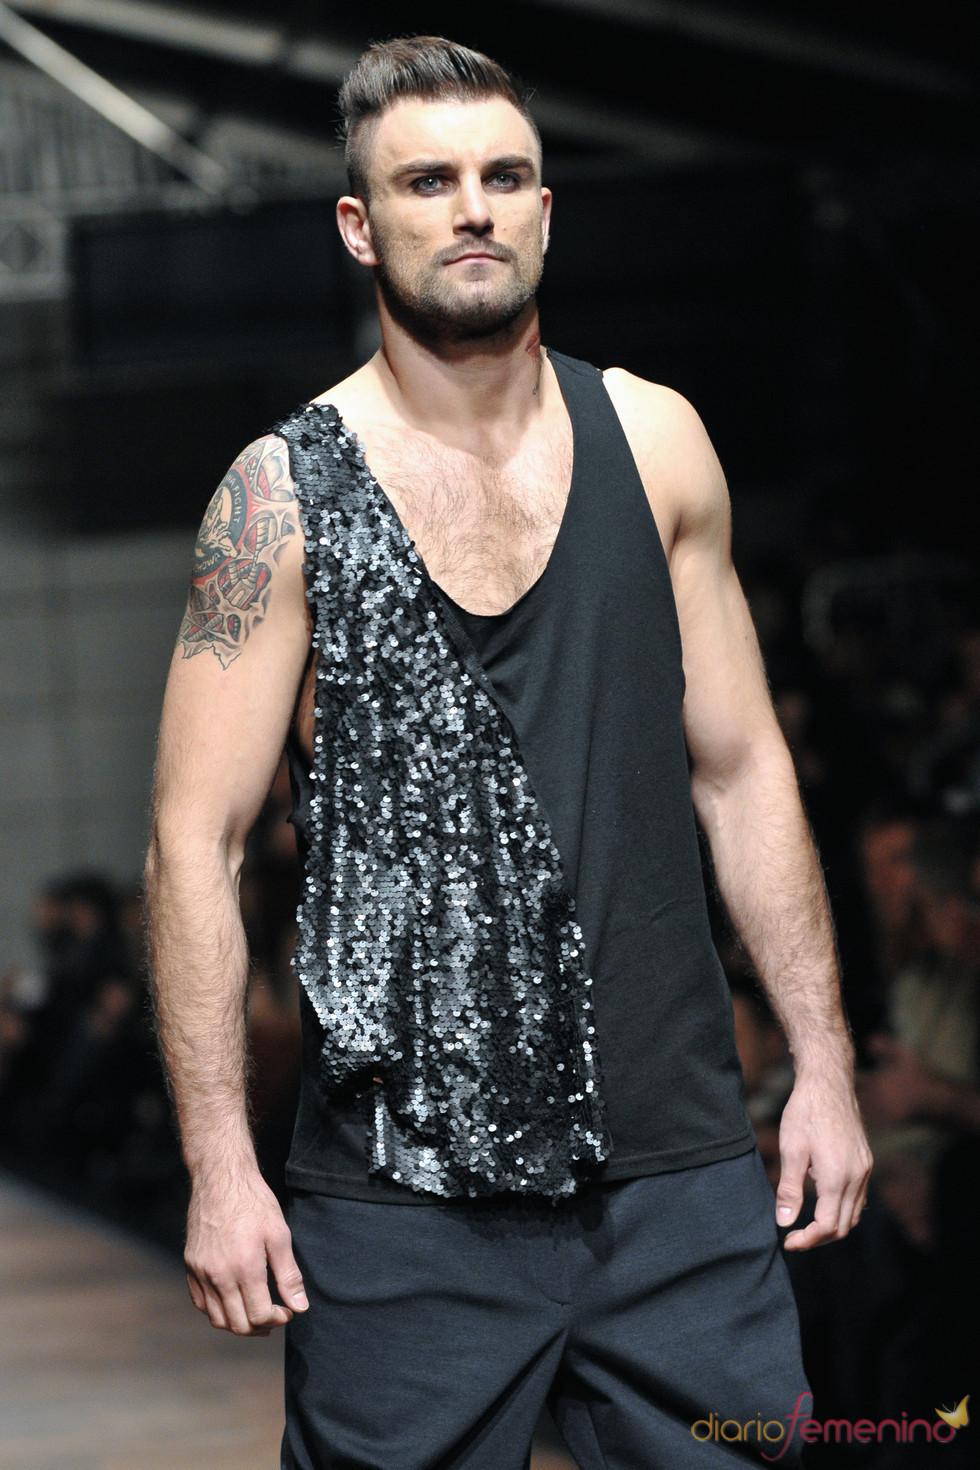 Camiseta para hombre con lentejuelas de Monika Ptaszek para la Poland Fashion Week